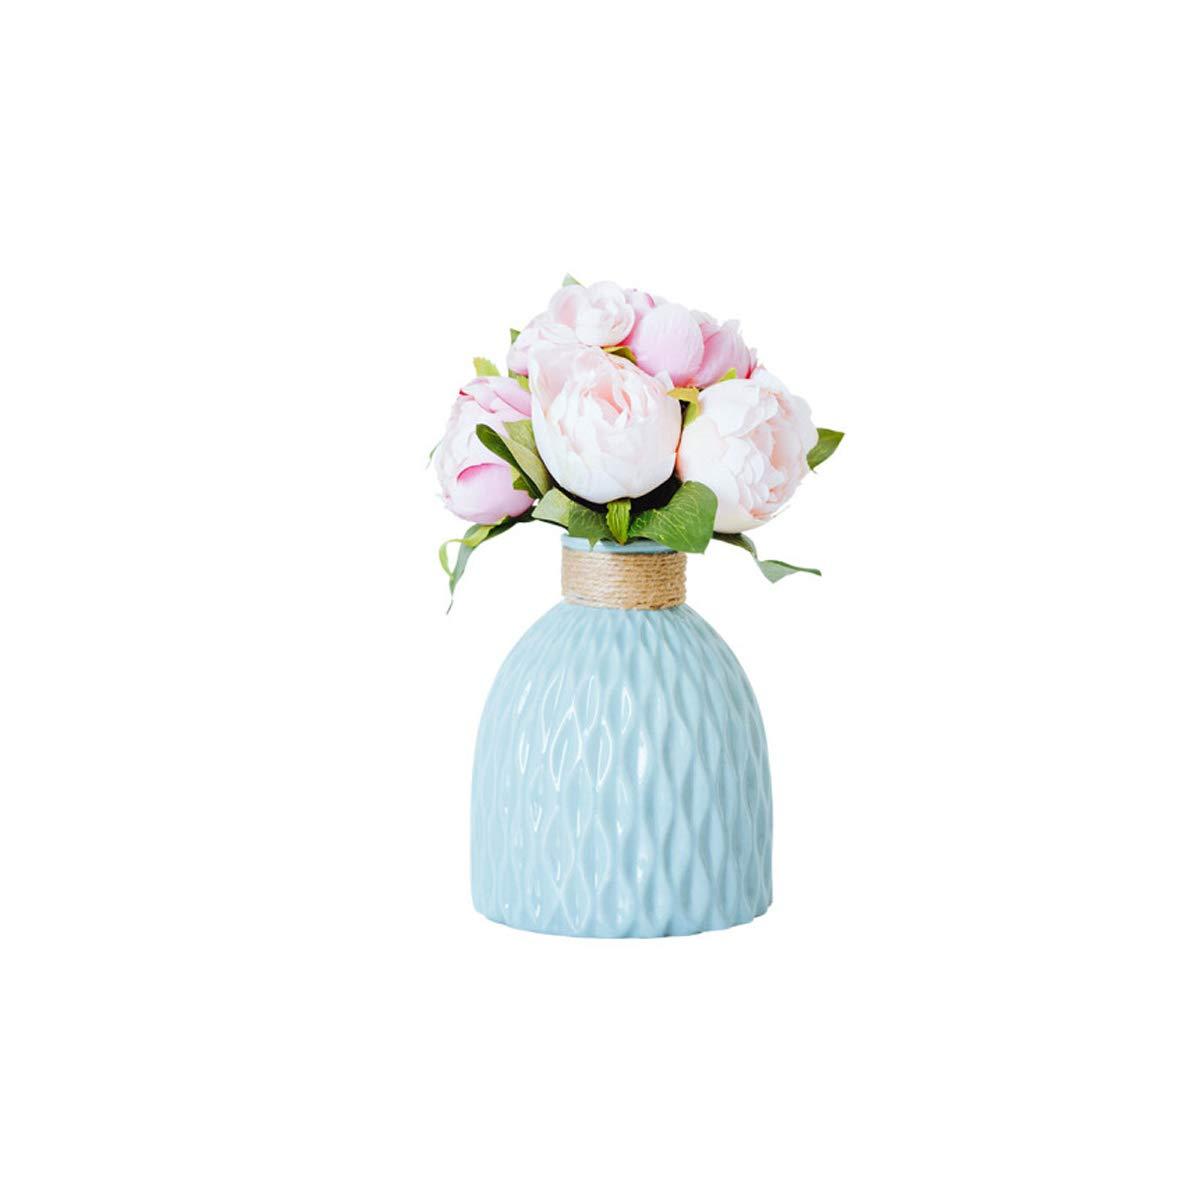 Amazon.com: HENGT Home Decoration Vase, Decoration Vase ...